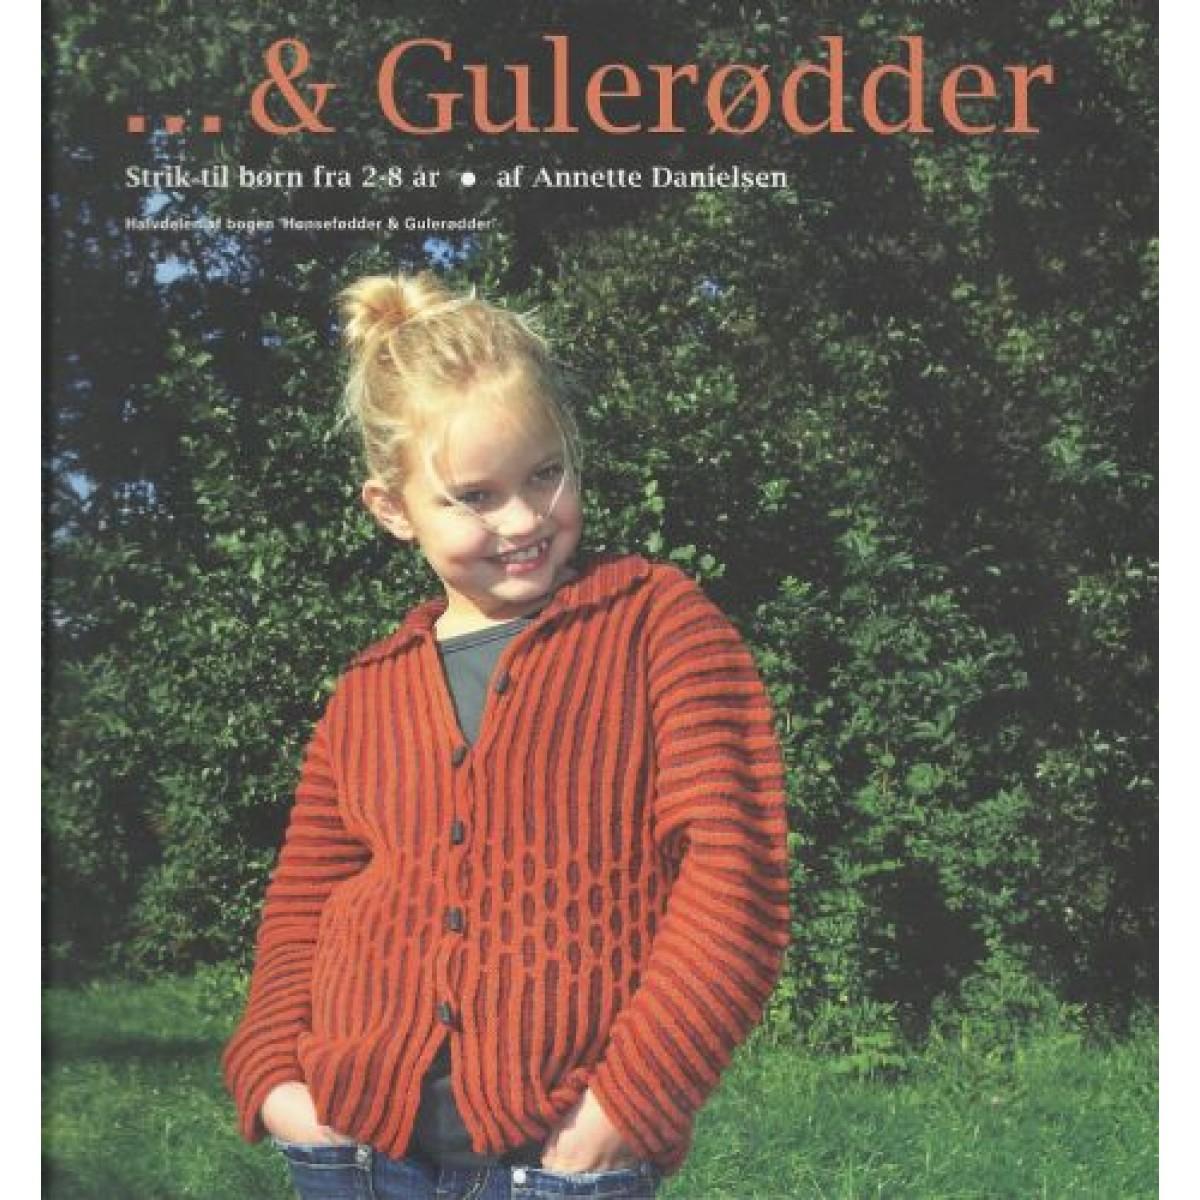 ...and Gulerødder-31